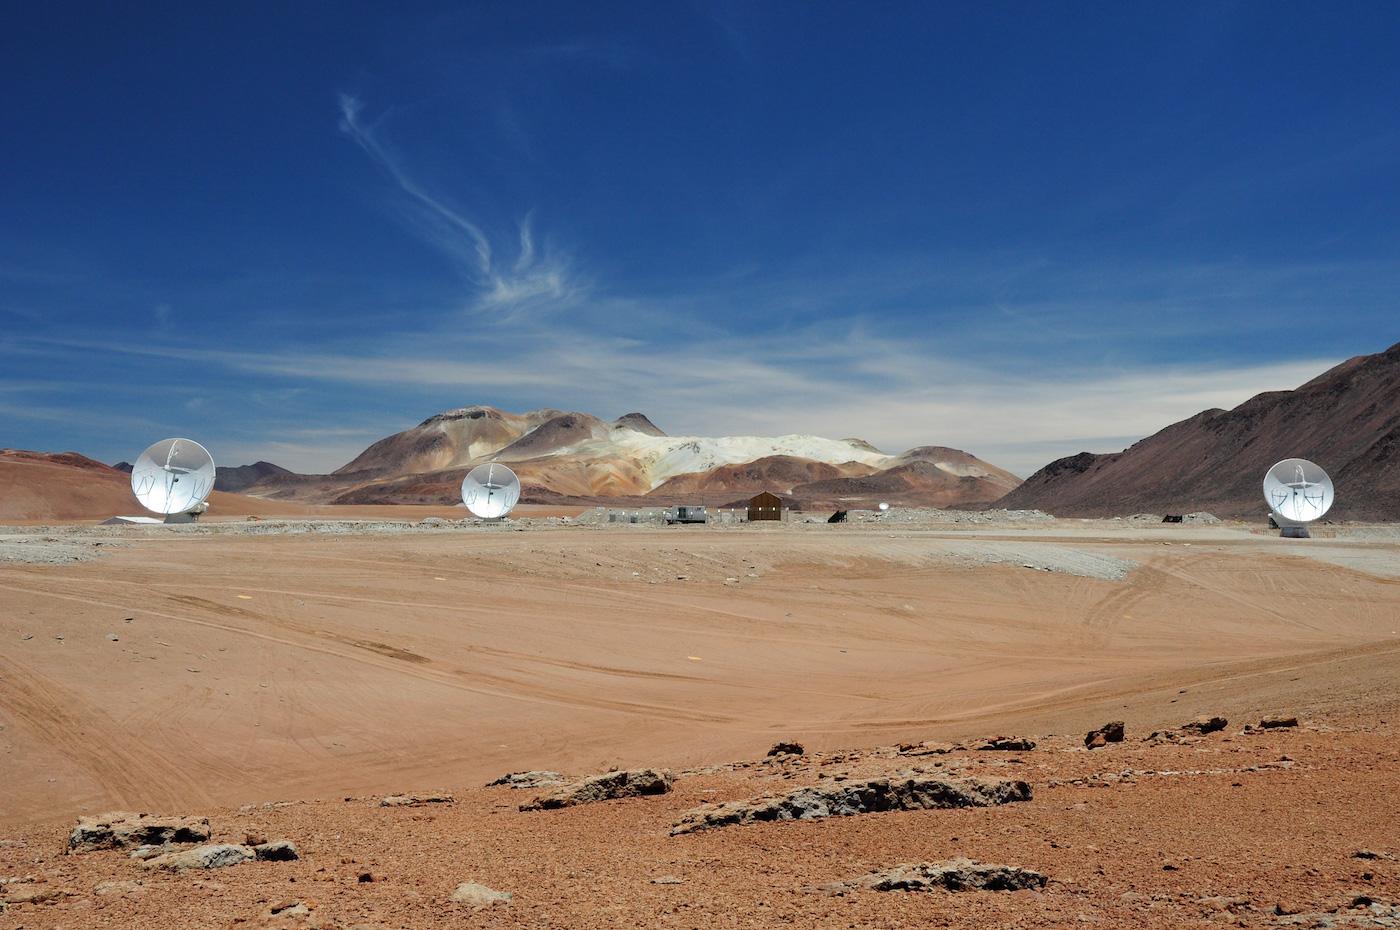 ALMA antennas interferometry, Atacama Desert